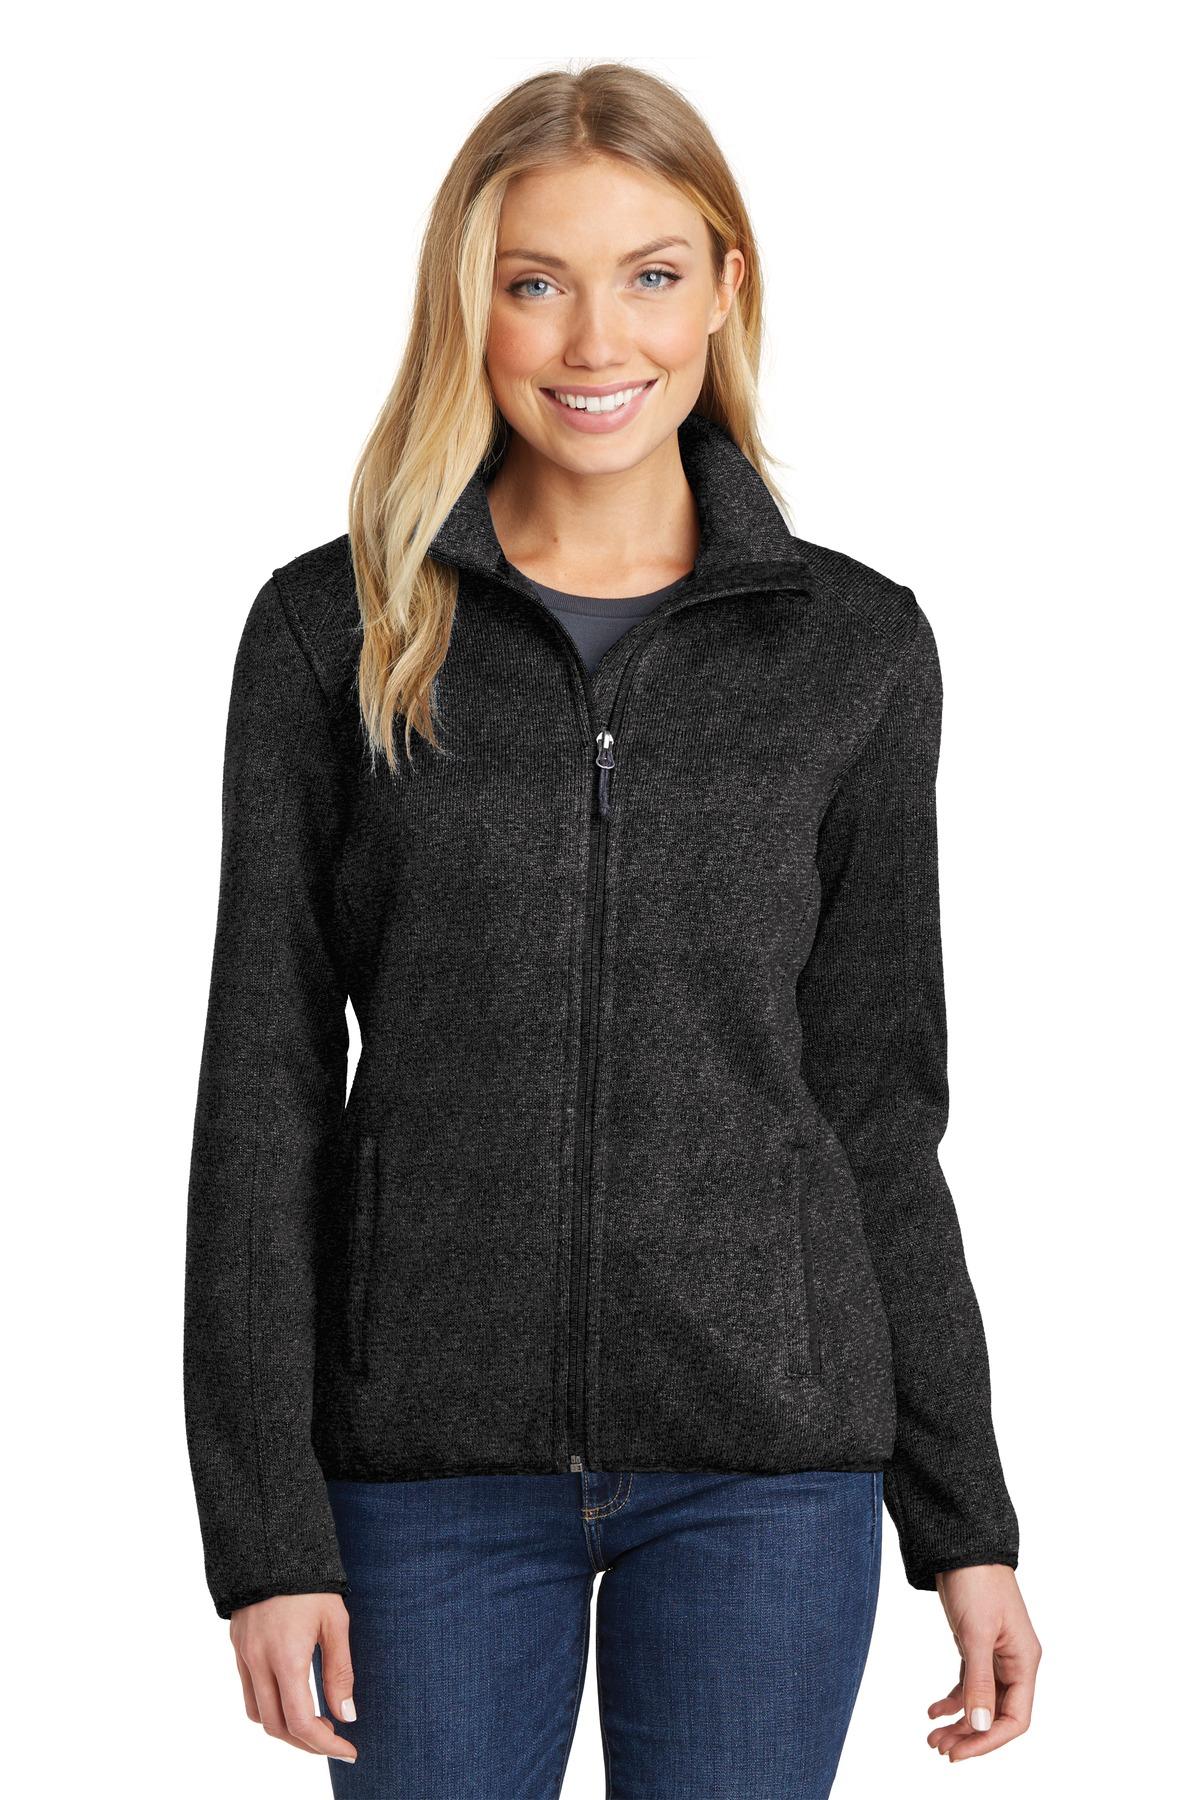 Port Authority L232 - Ladies Sweater Fleece Jacket - Outerwear